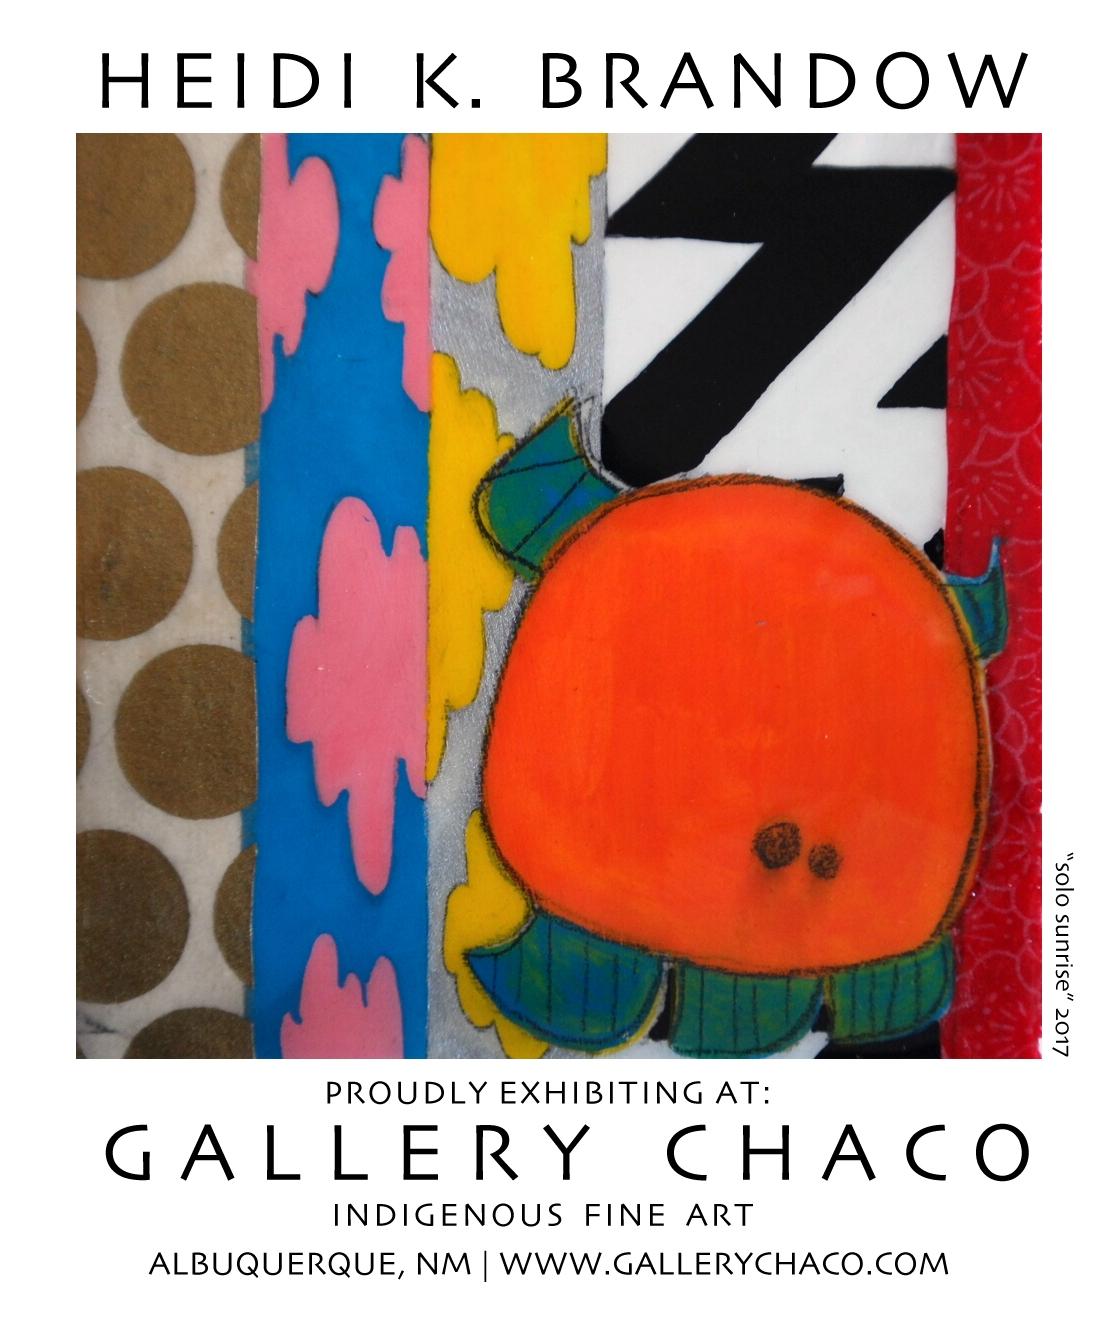 gallerychaco